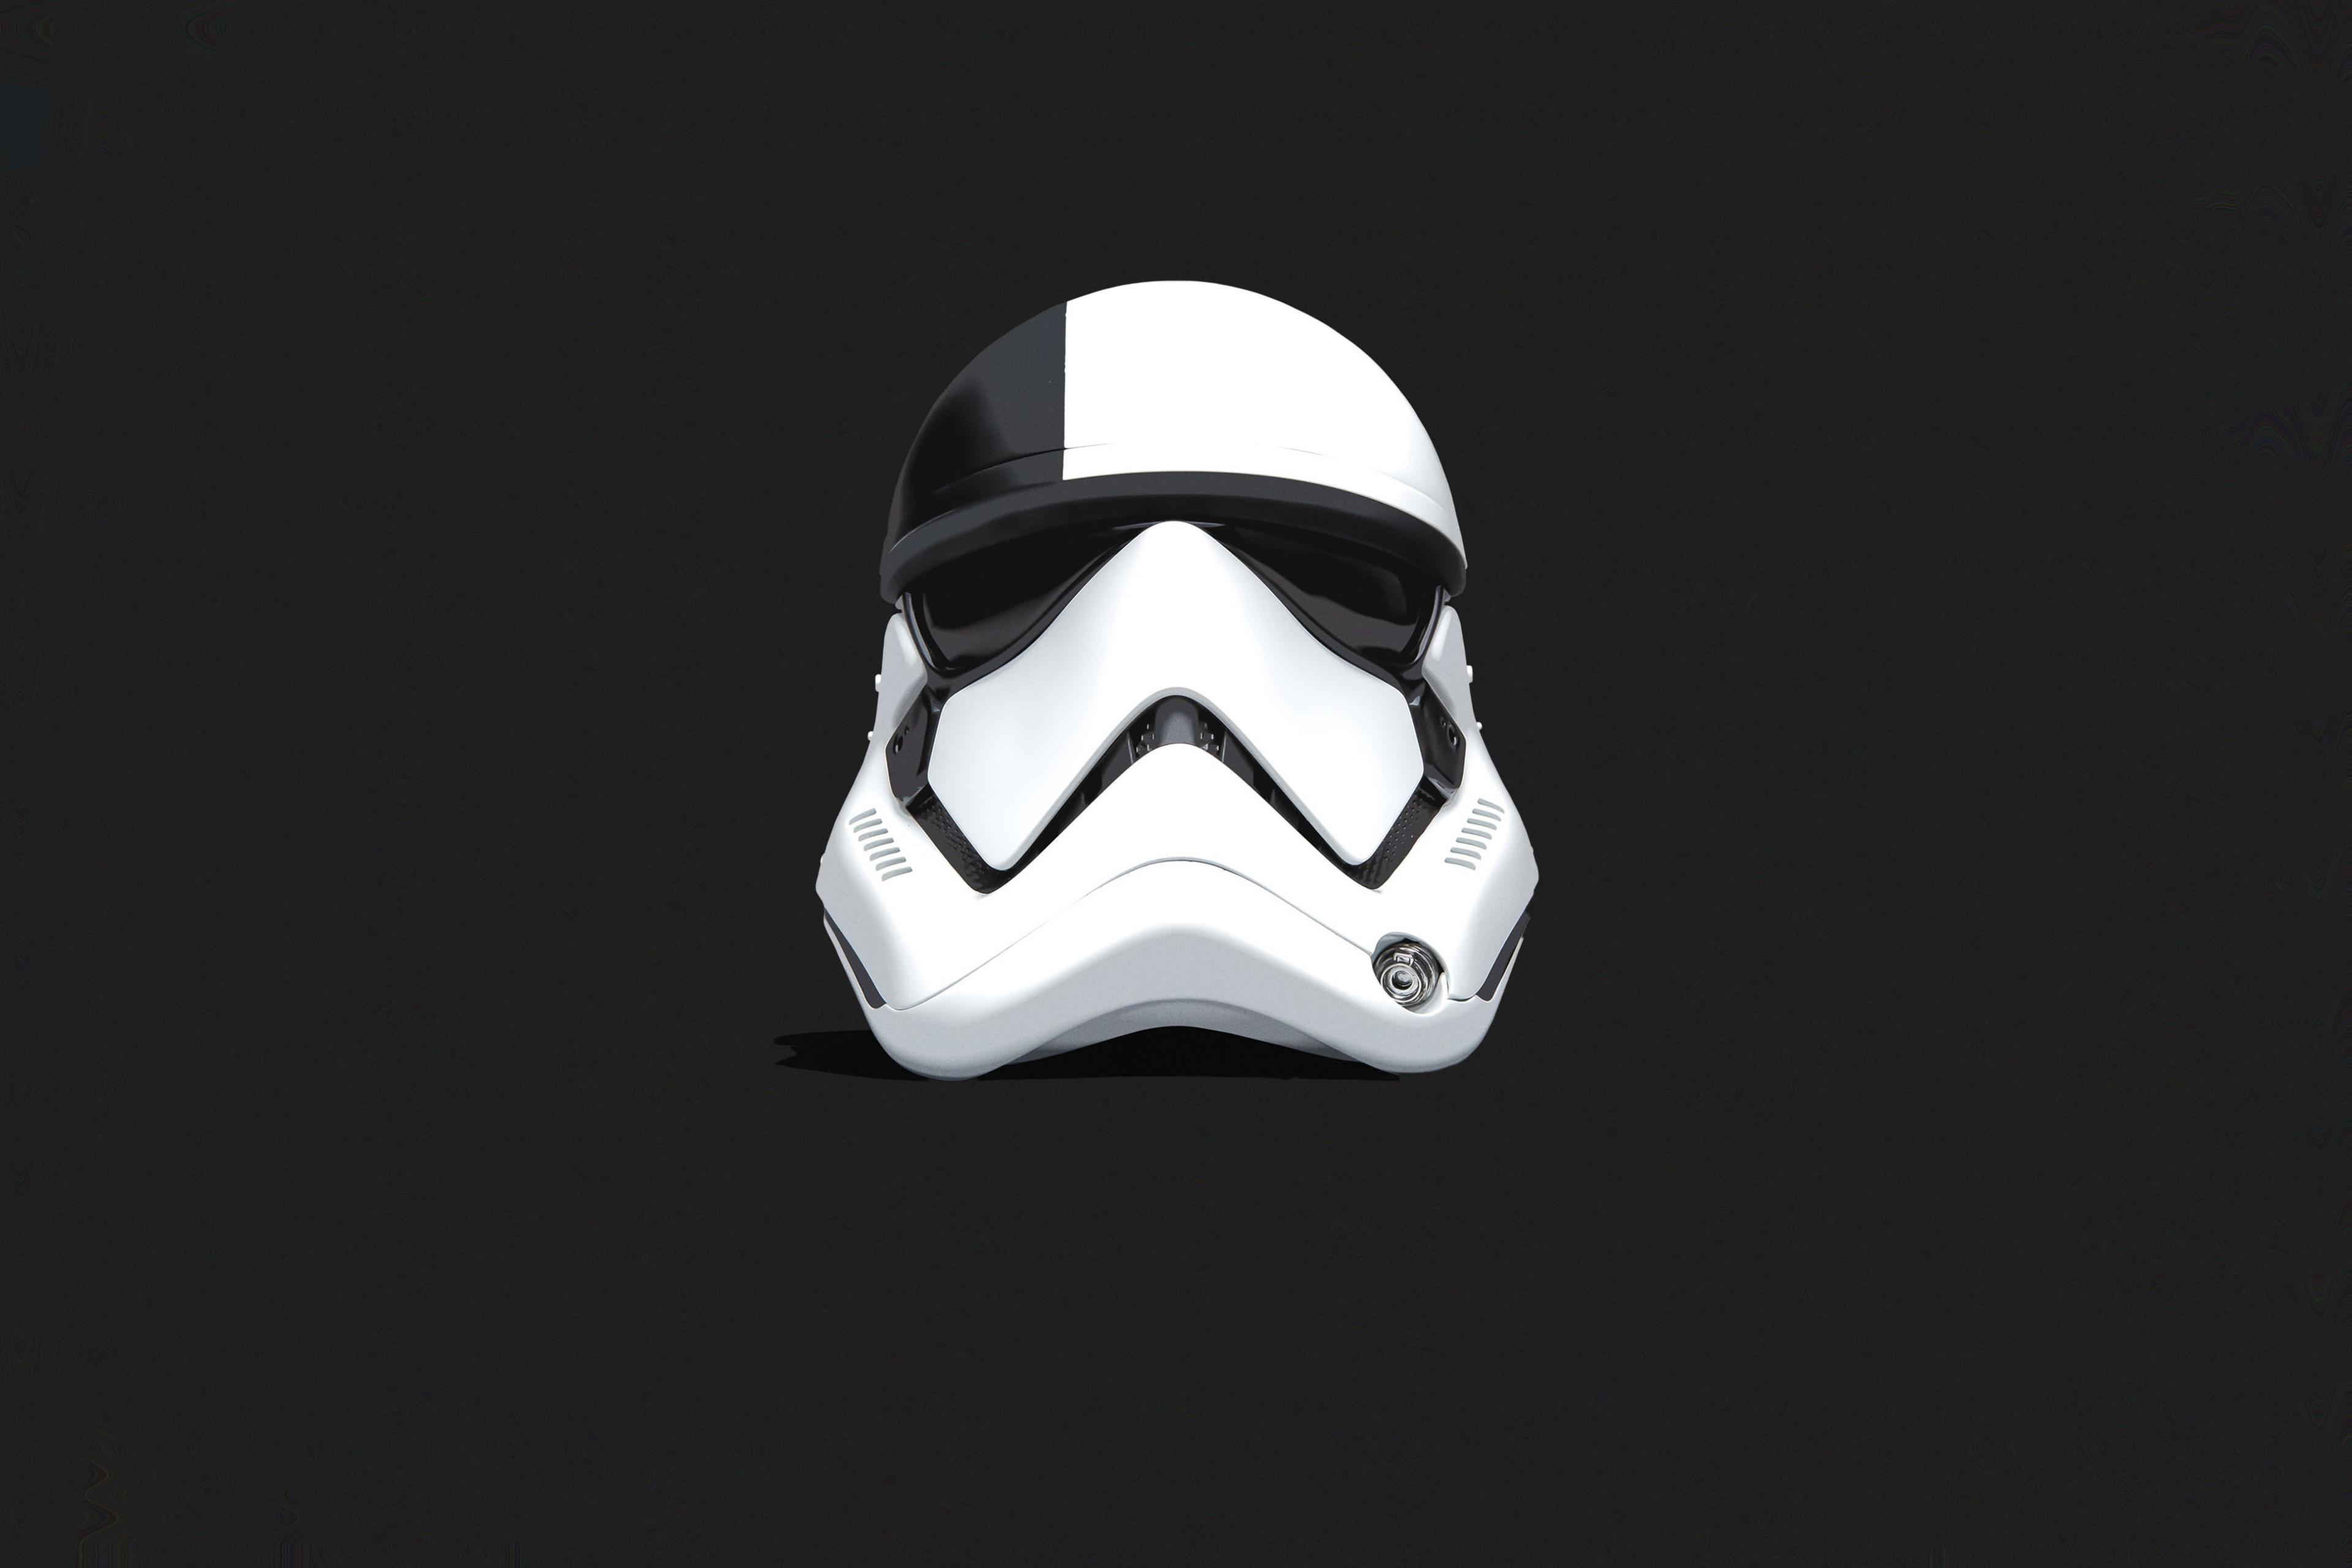 540x960 Stormtrooper Helmet Star Wars 540x960 Resolution Wallpaper Hd Minimalist 4k Wallpapers Images Photos And Background